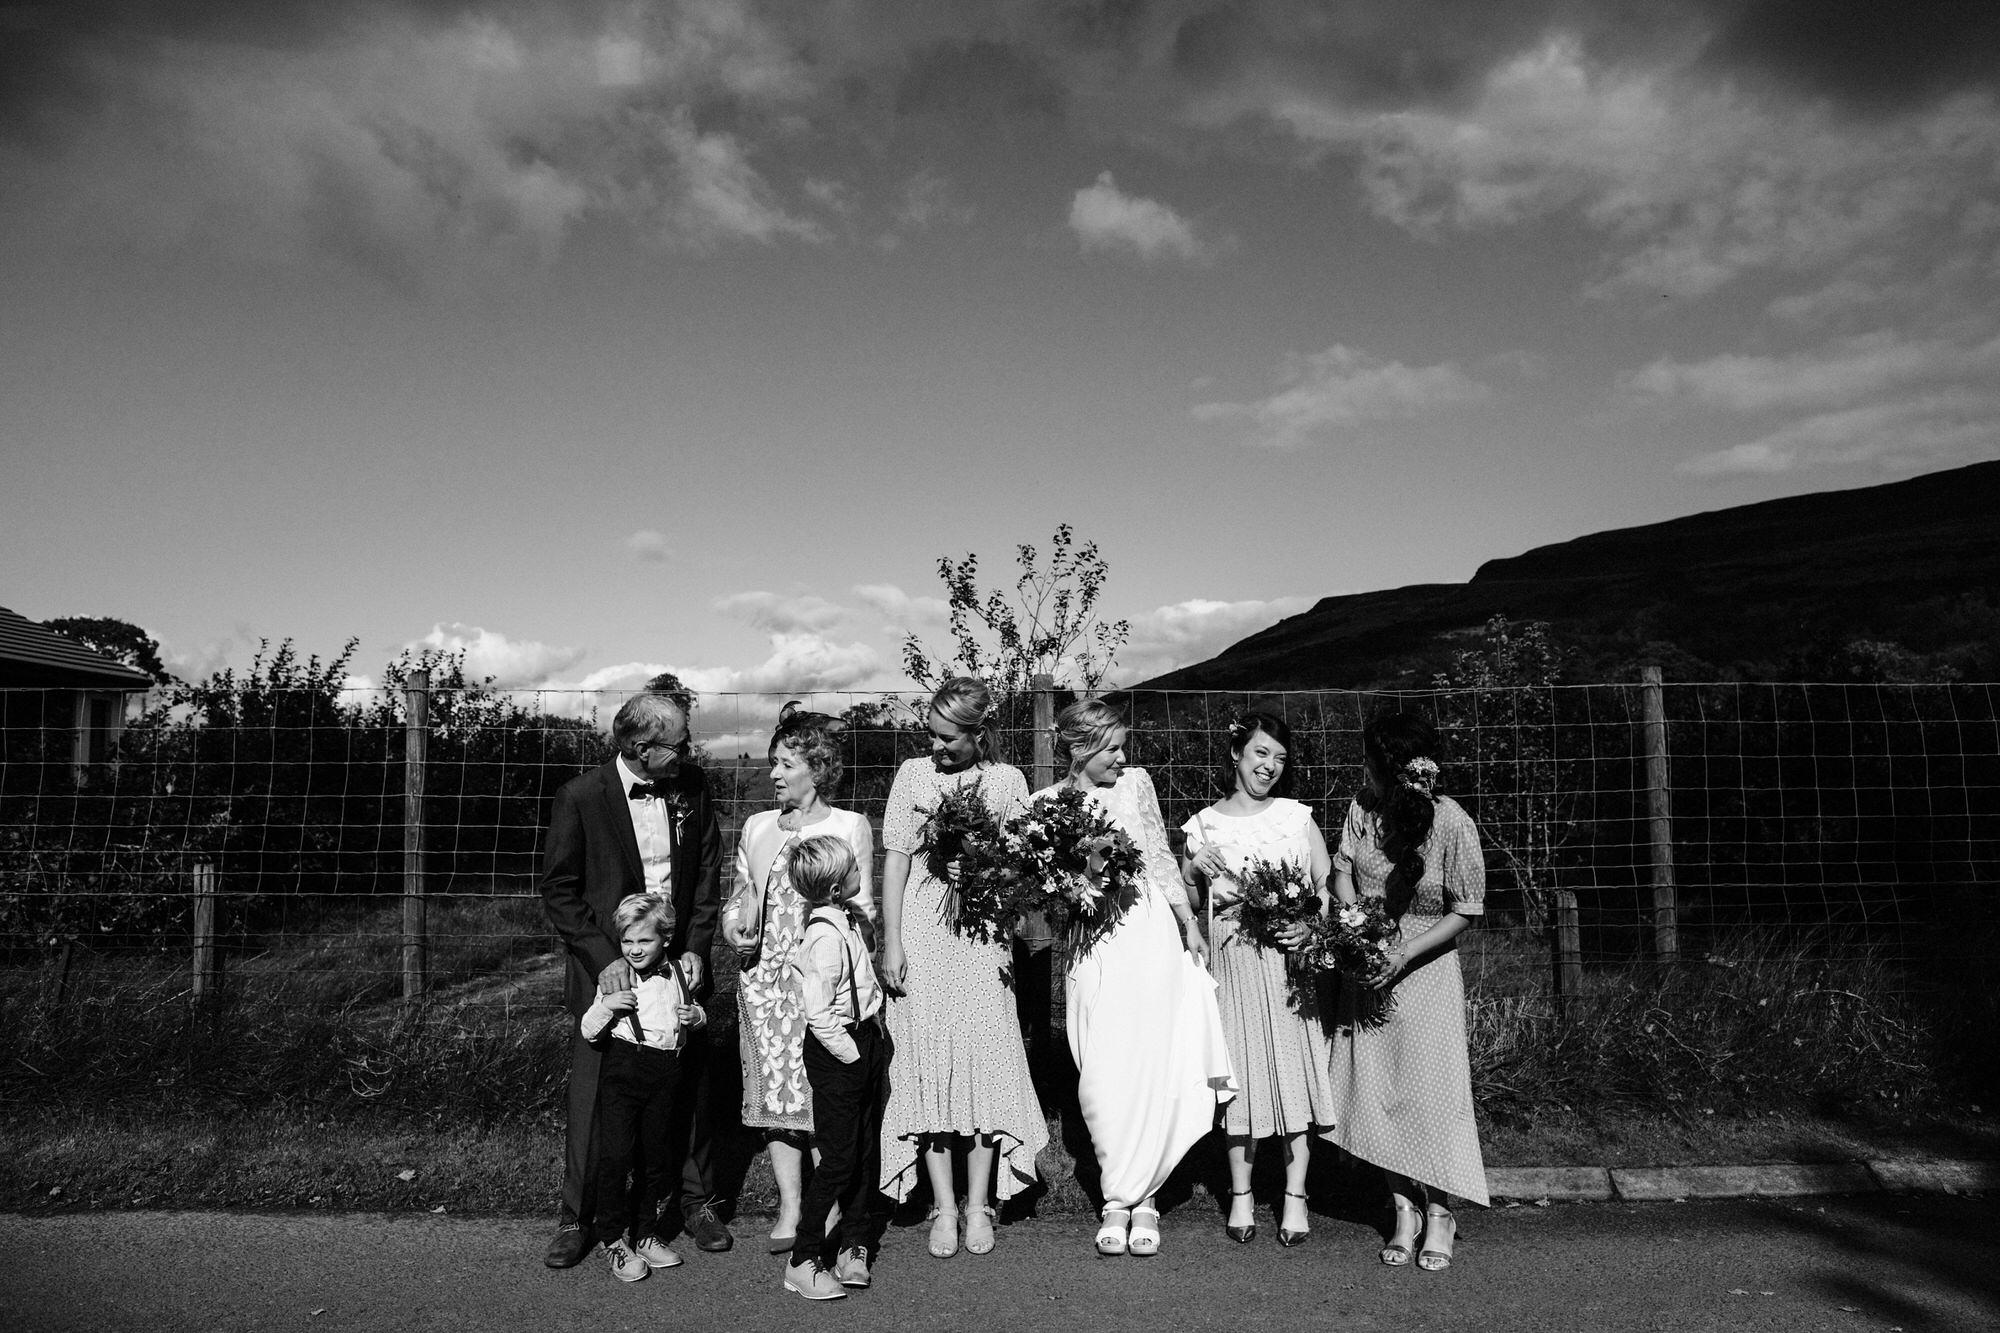 012 TIN SHED KNOCKRAICH WEDDING AUTUMN ZOE ALEXANDRA PHOTOGRAPHY